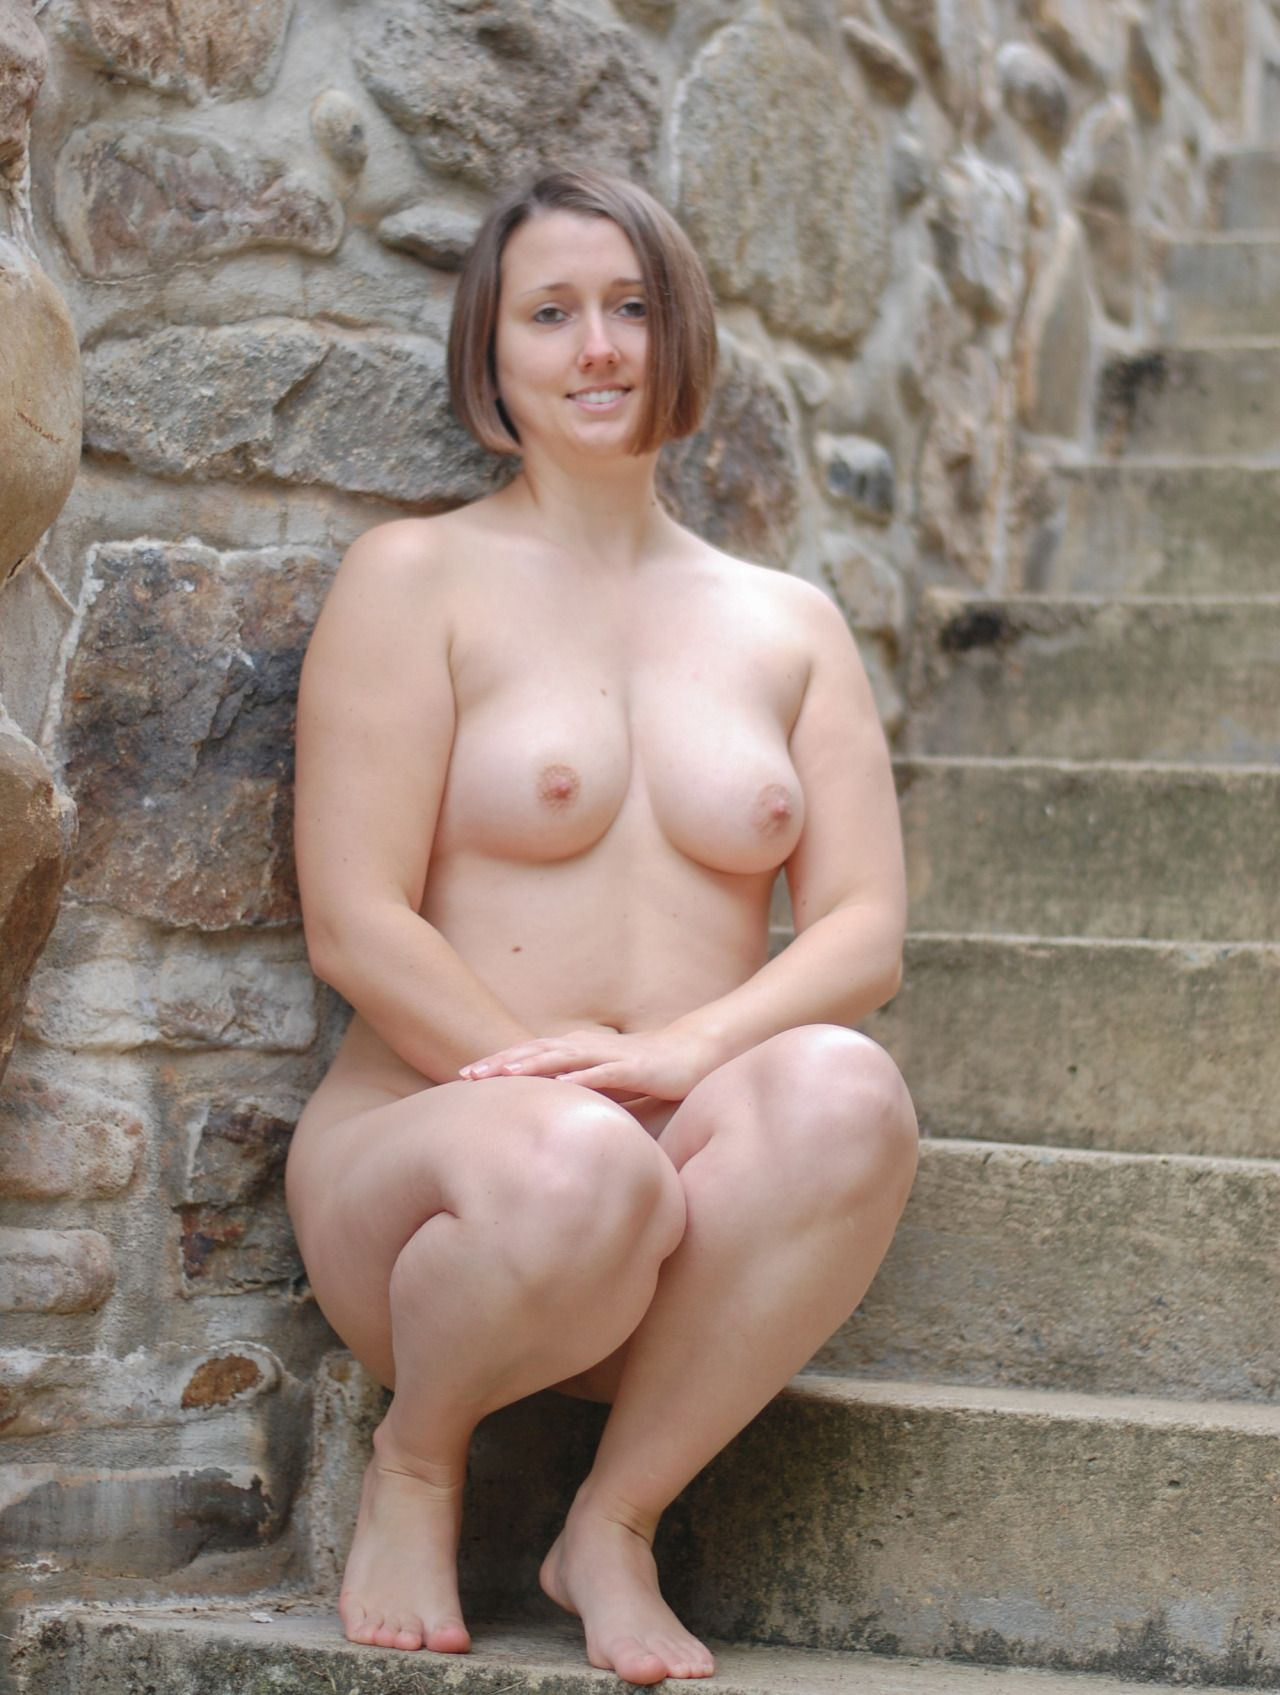 Found wife nude